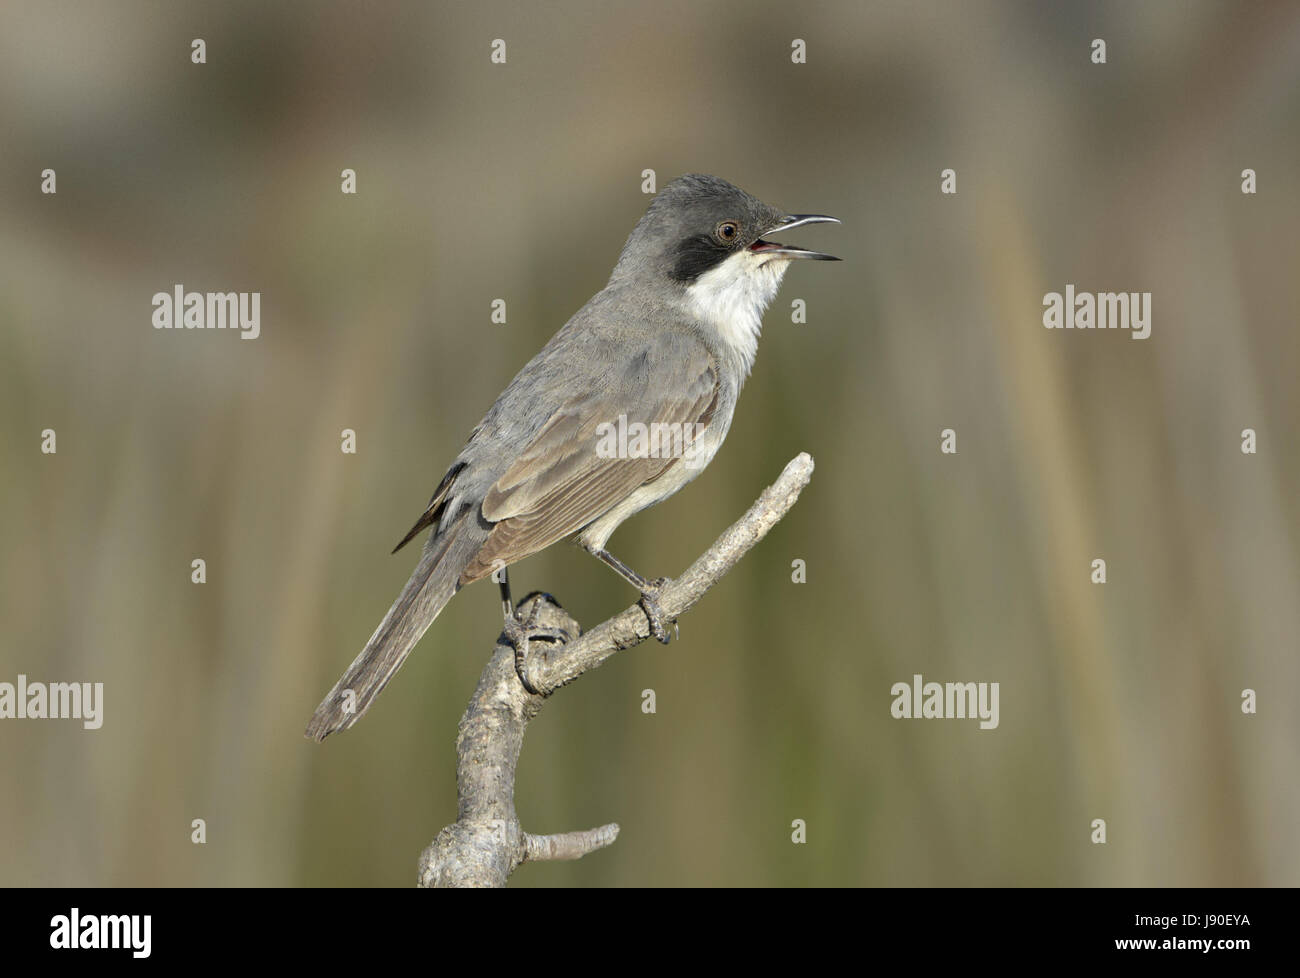 Eastern Orphean Warbler - Sylvia crassirostris - Stock Image